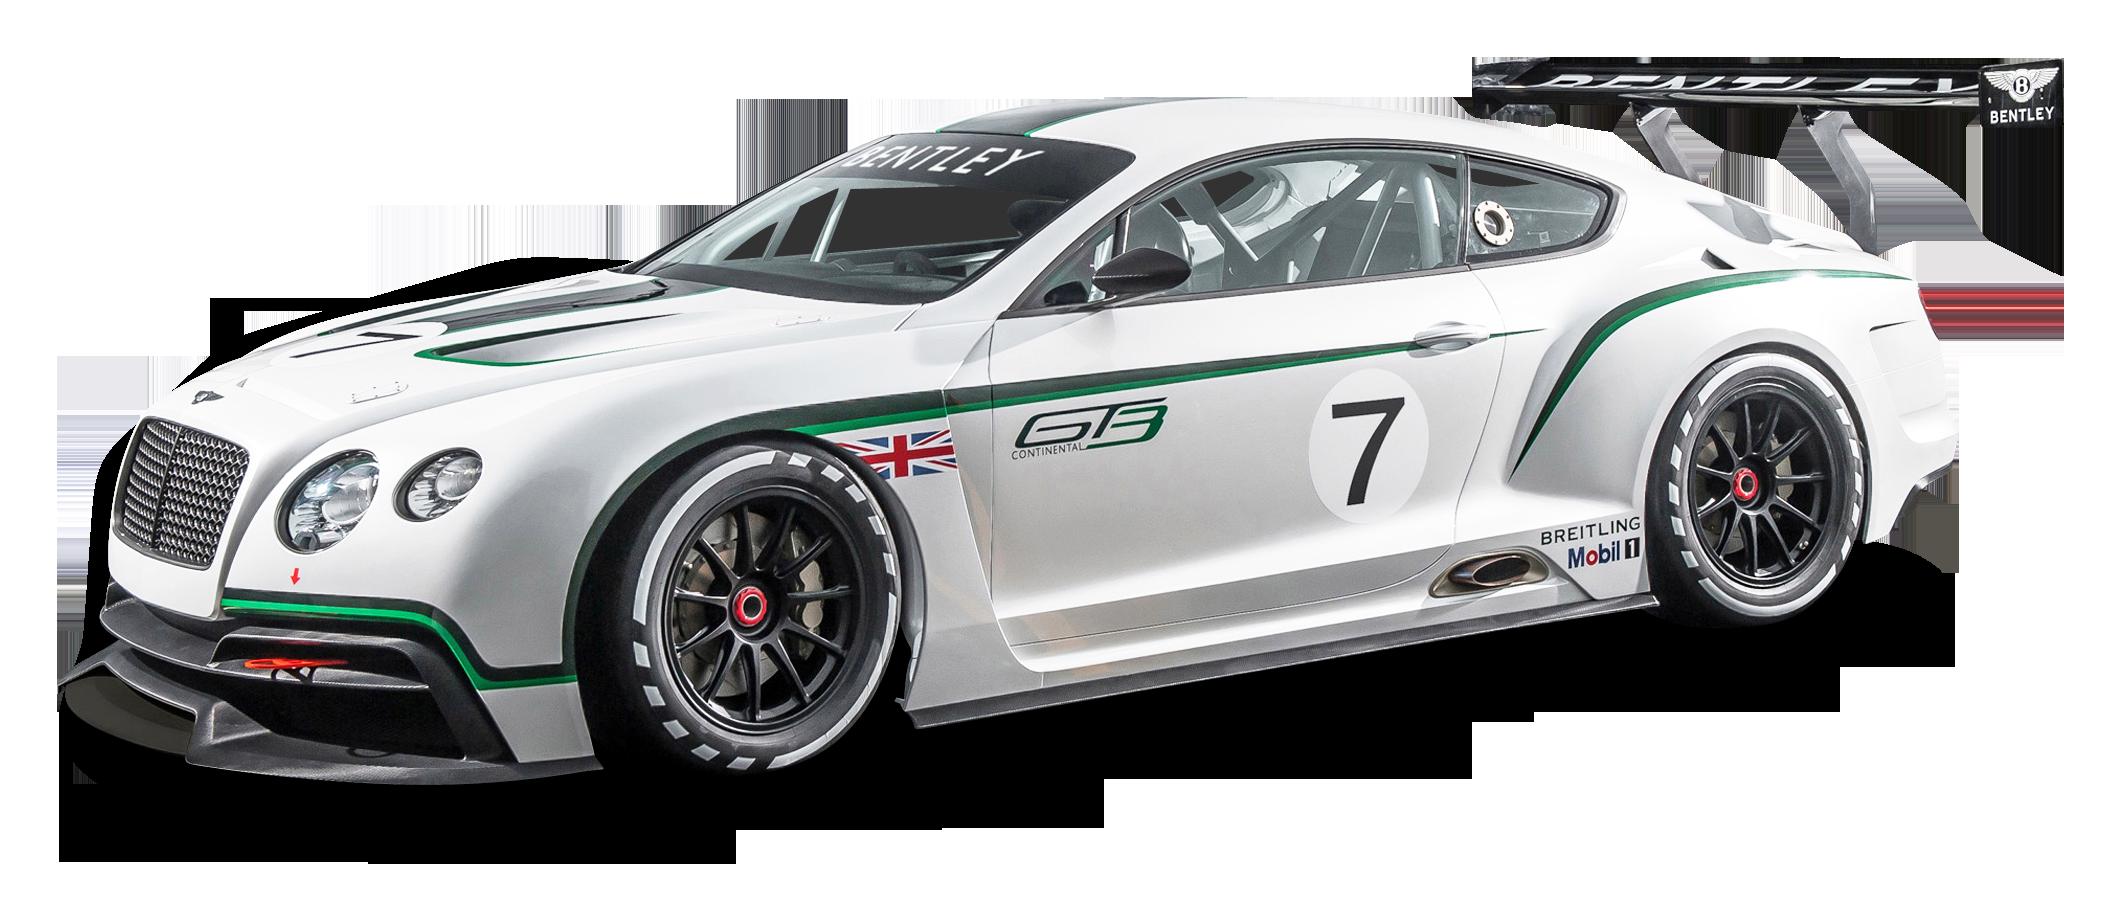 Bentley Continental GT3 R Race Car PNG Image